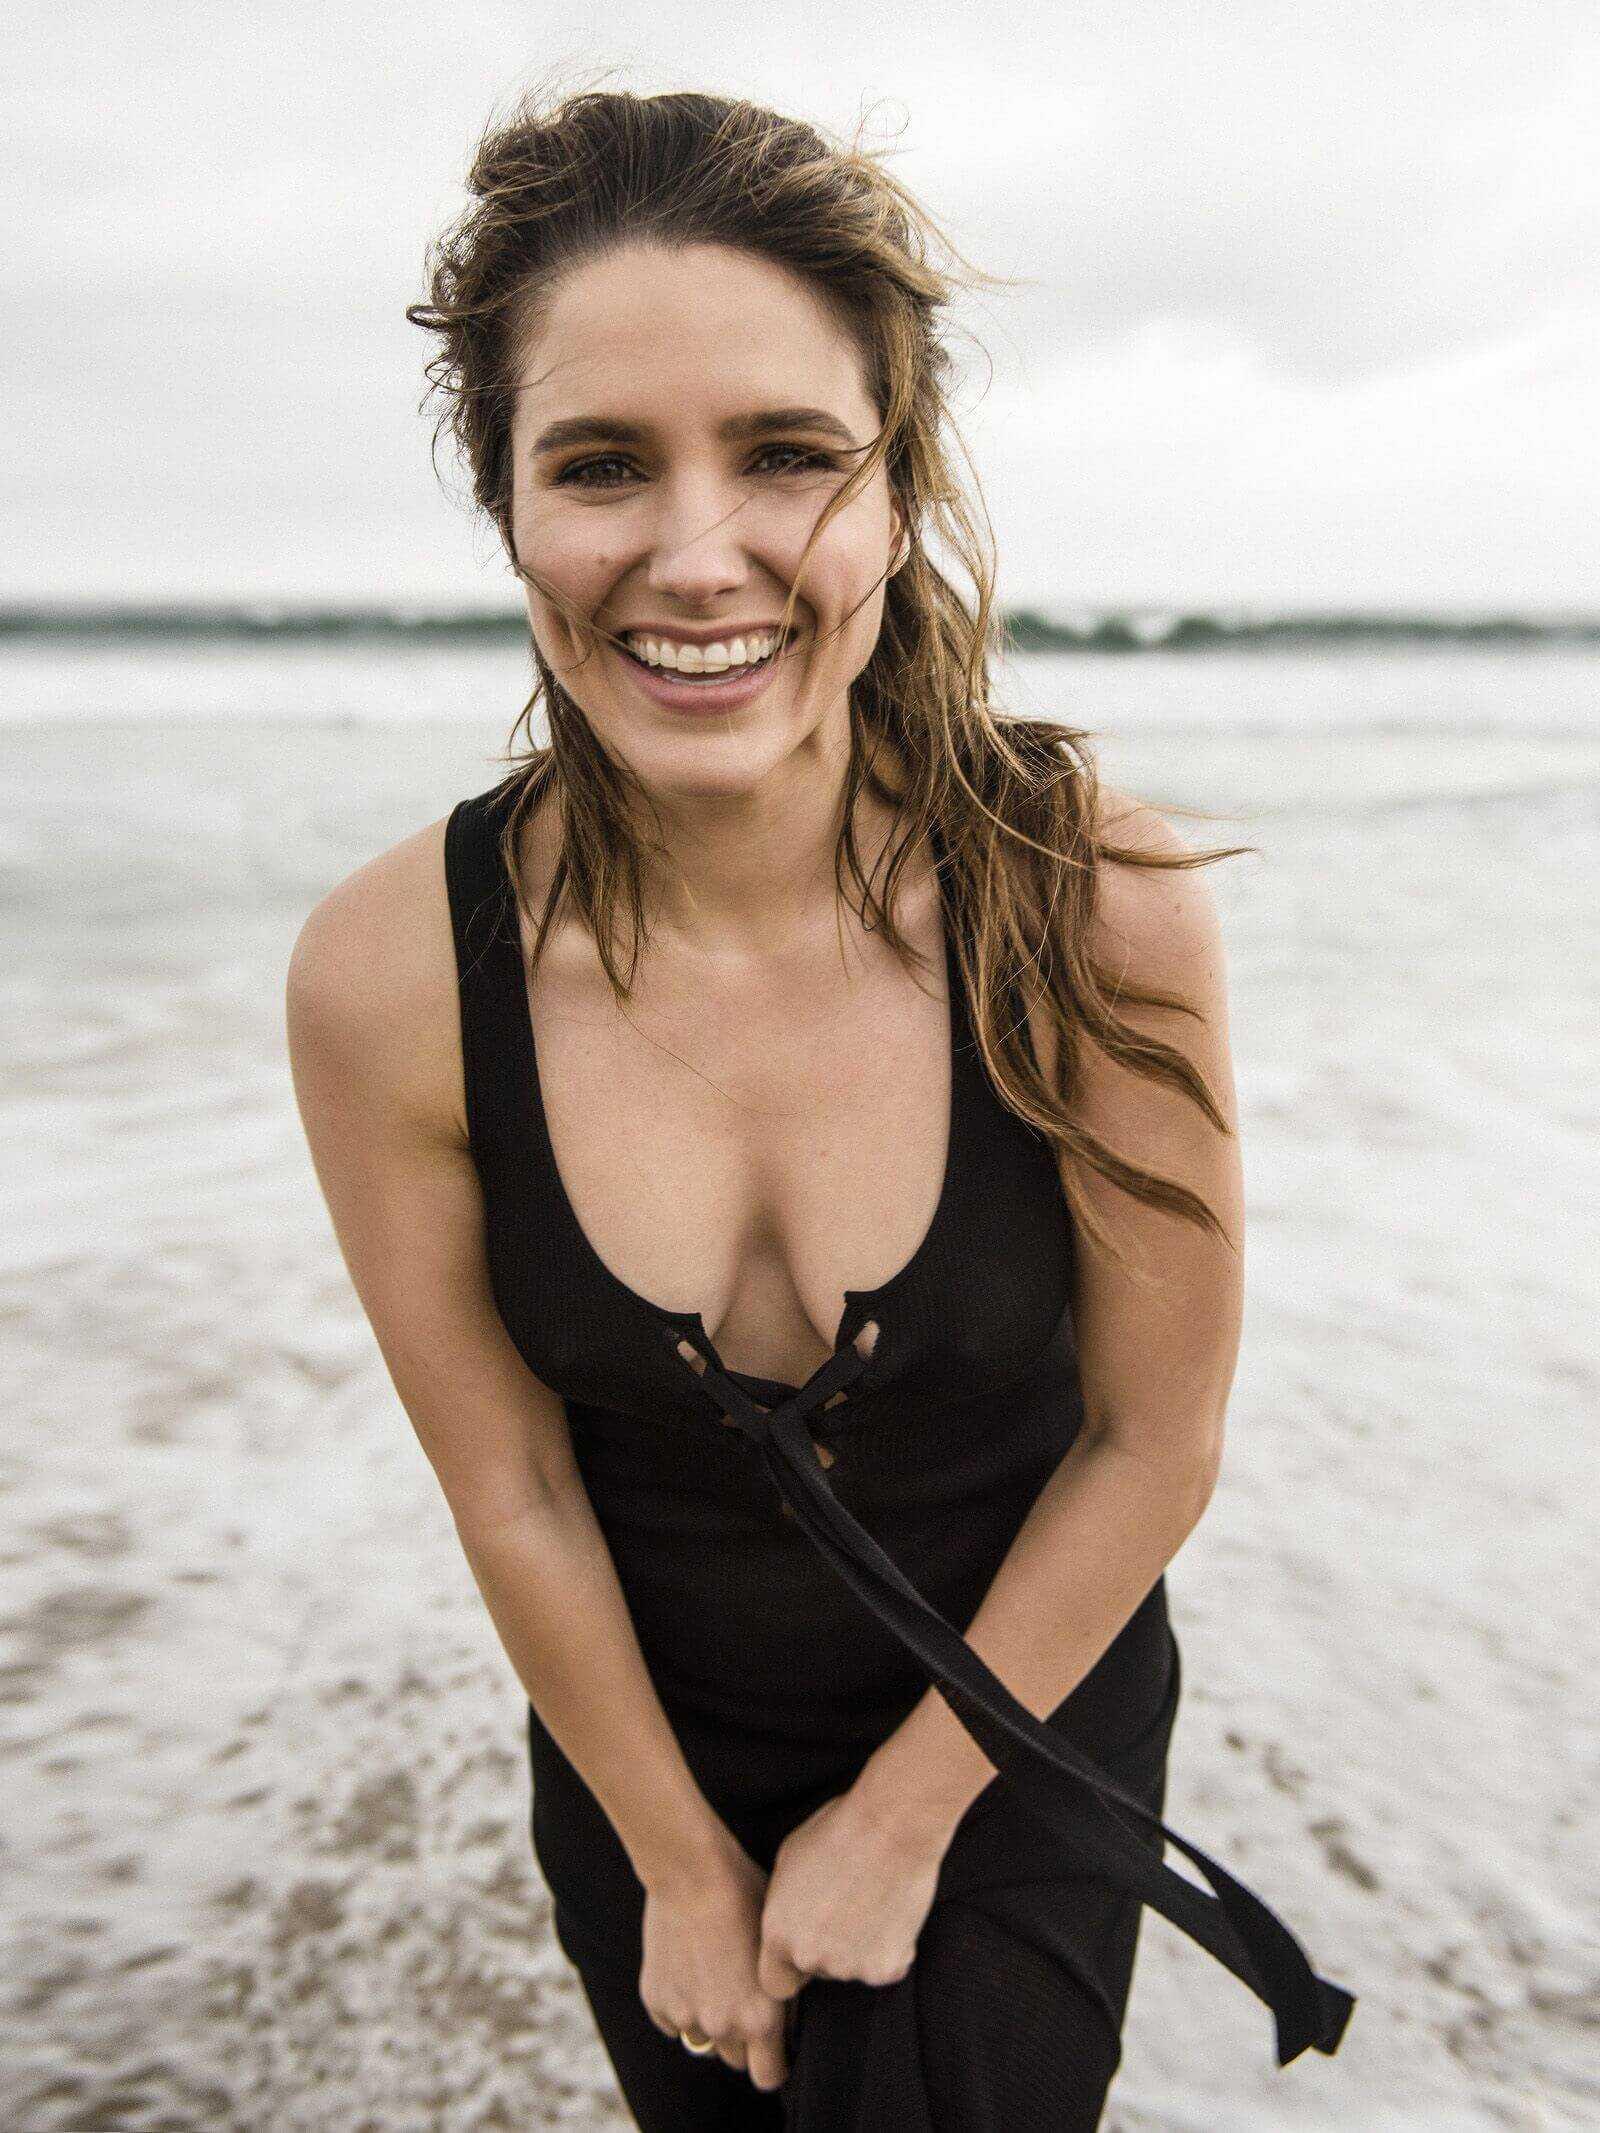 sophia-bush-hot-cleavage-pics